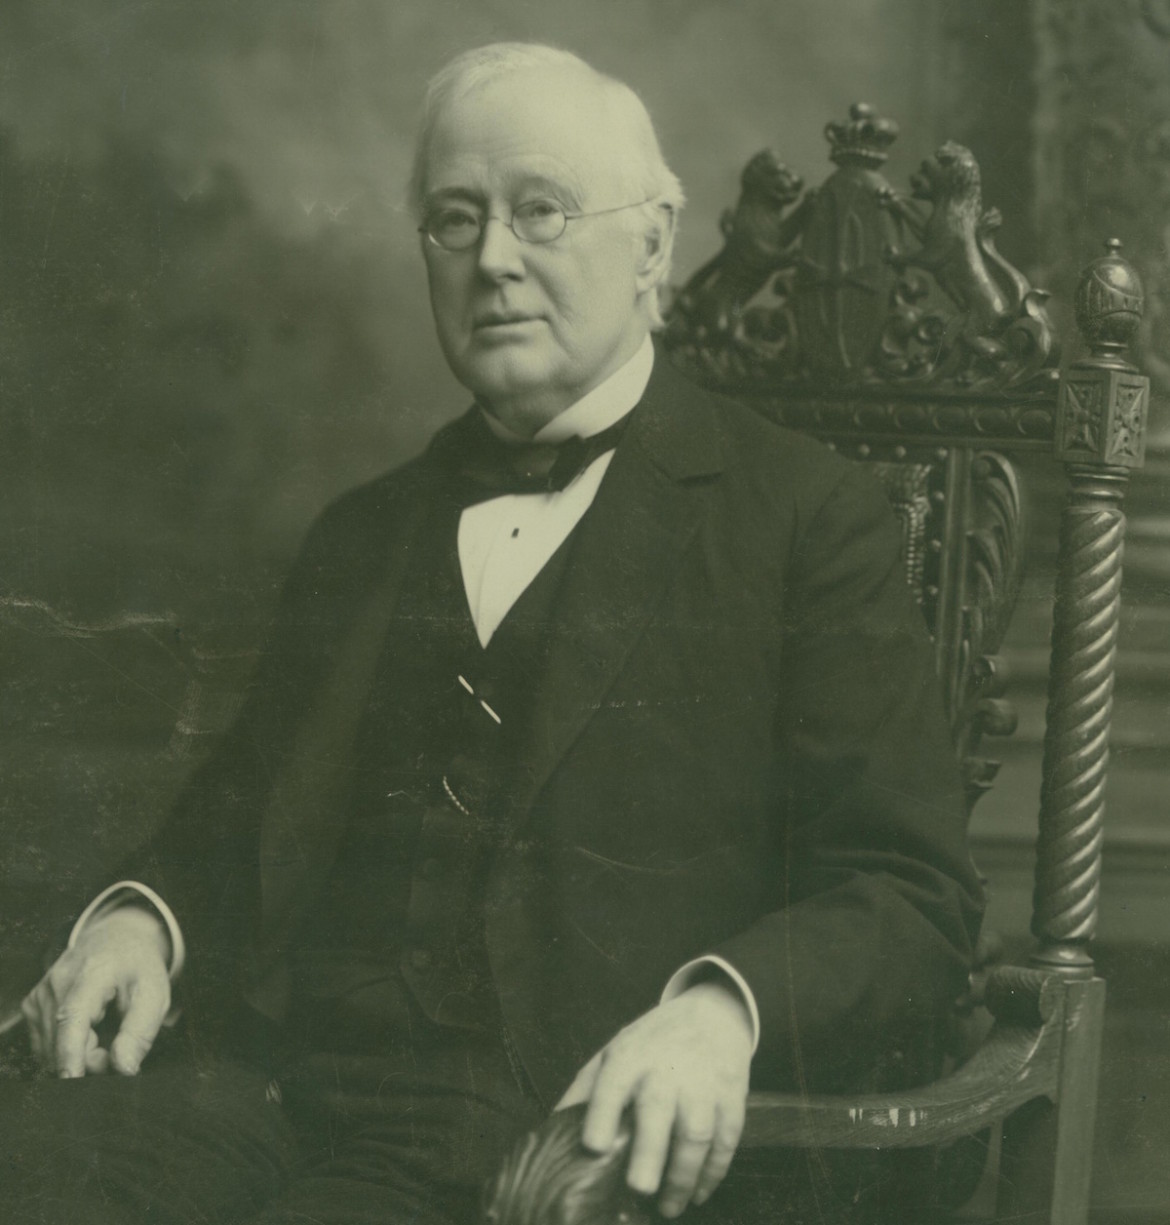 George Frisbee Hoar